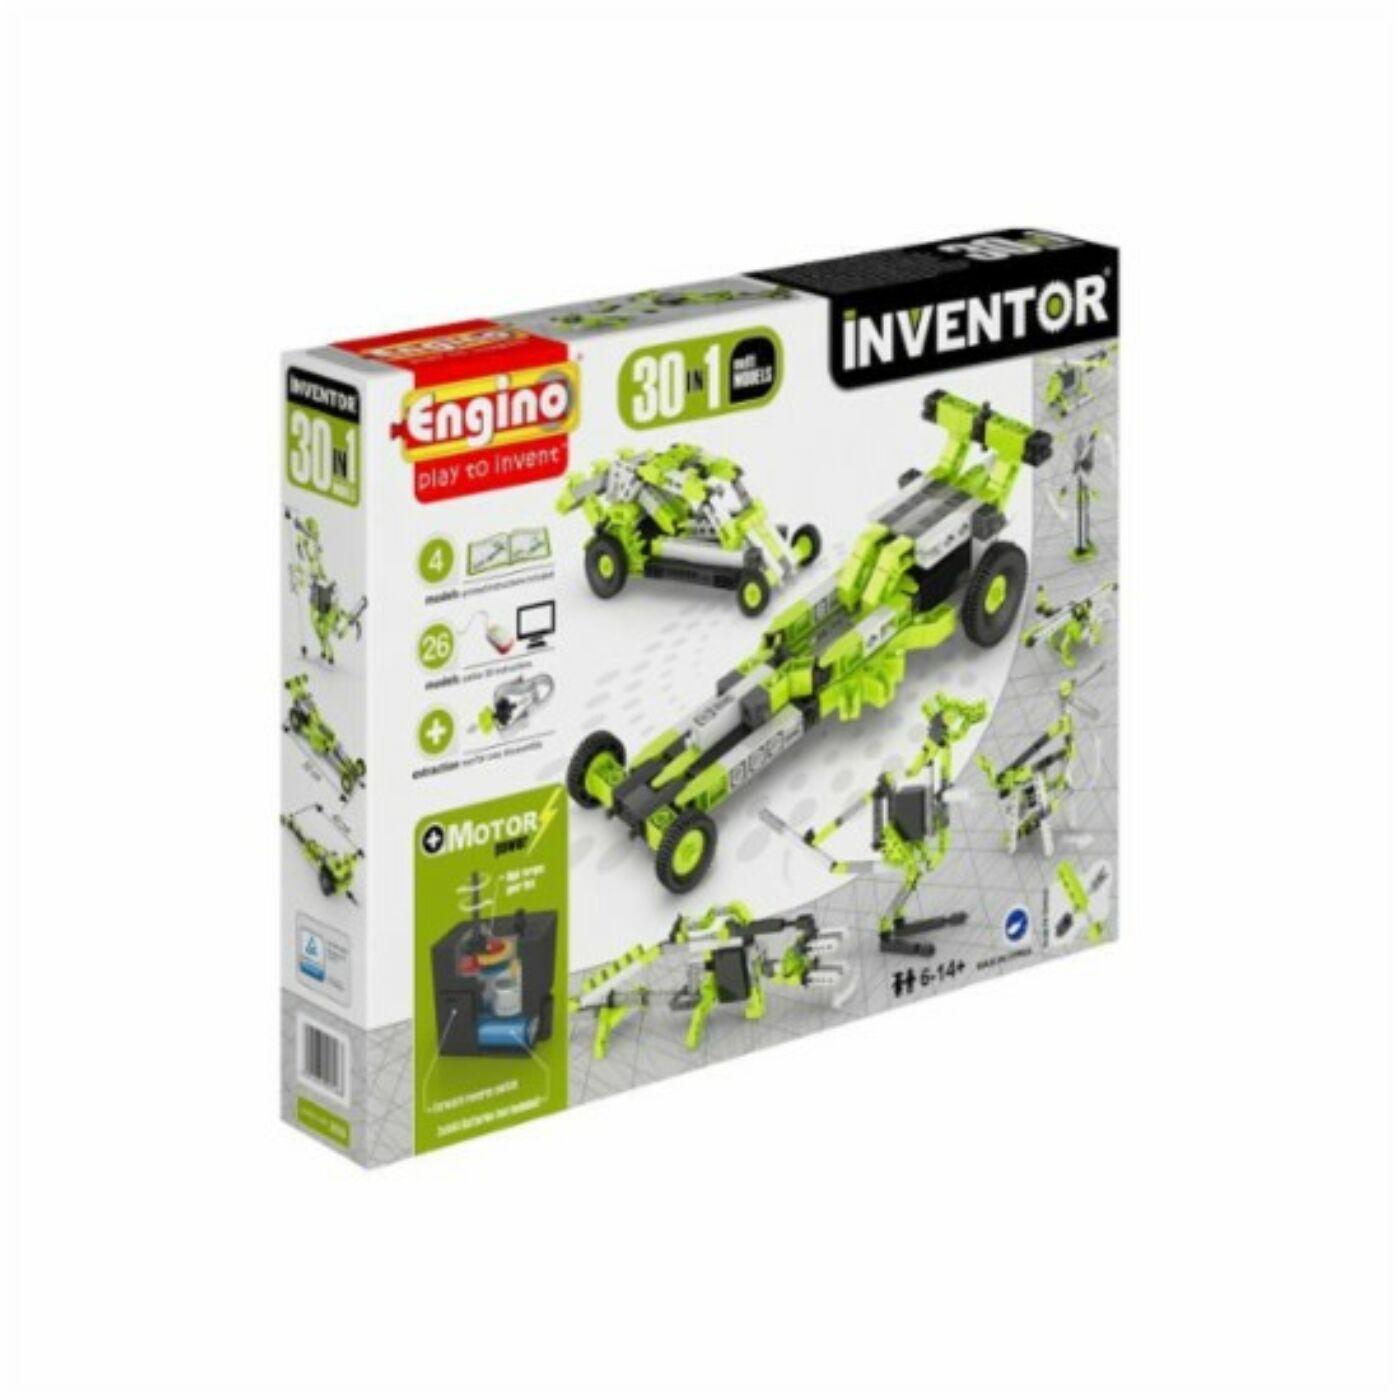 Engino Inventor motorizált modellek 30in1